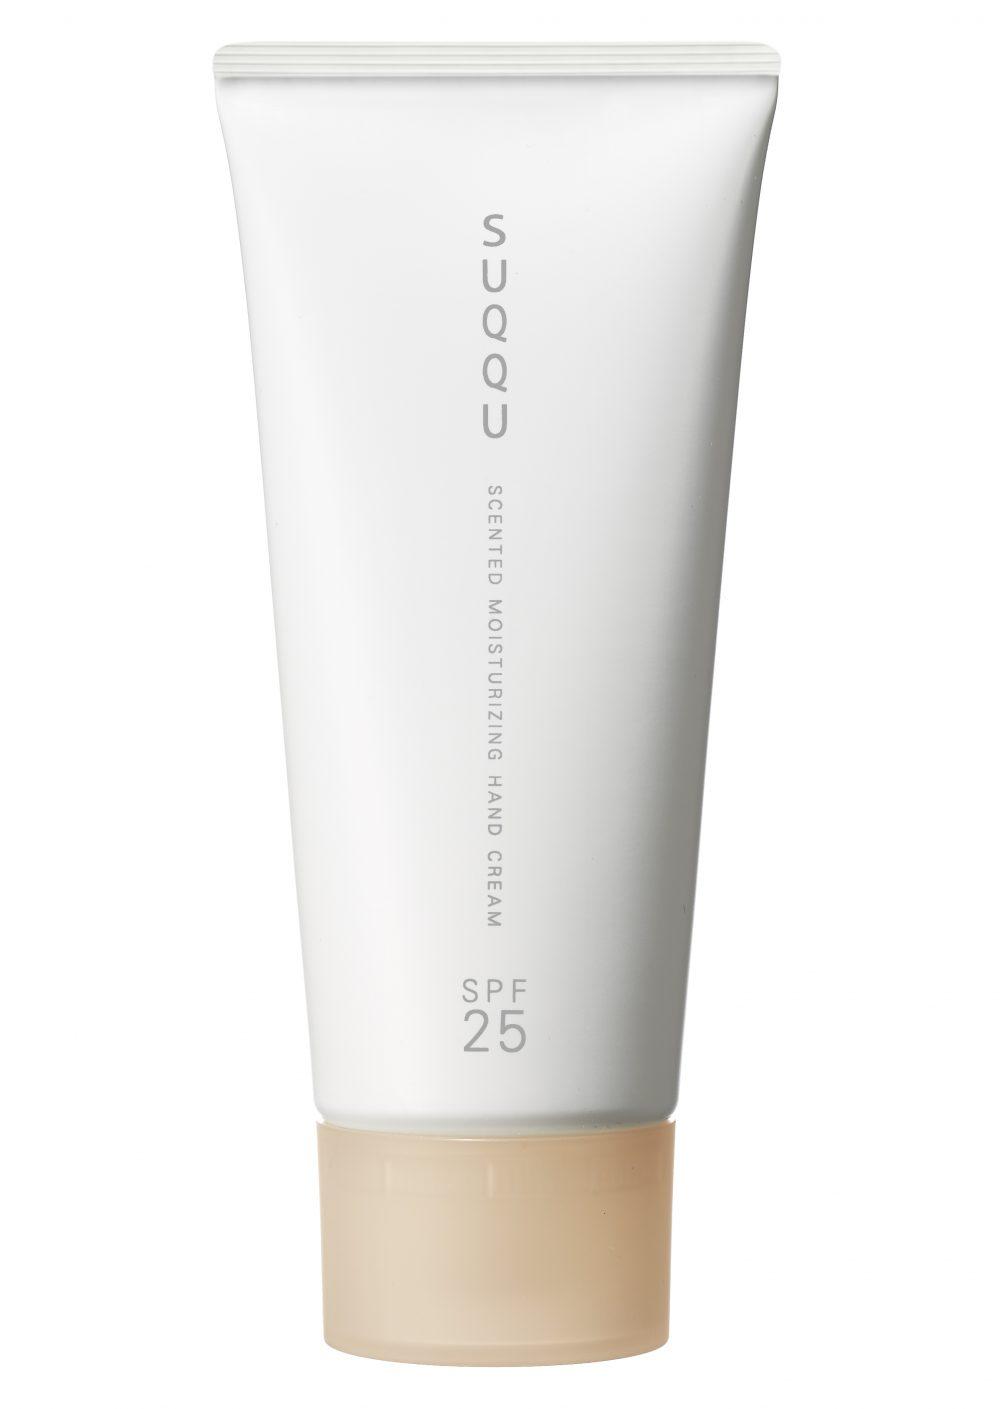 2018/06/SUQQU_scented_moisturizing_hand_cream_YN_kirinuki_009_02_2_bb.jpg